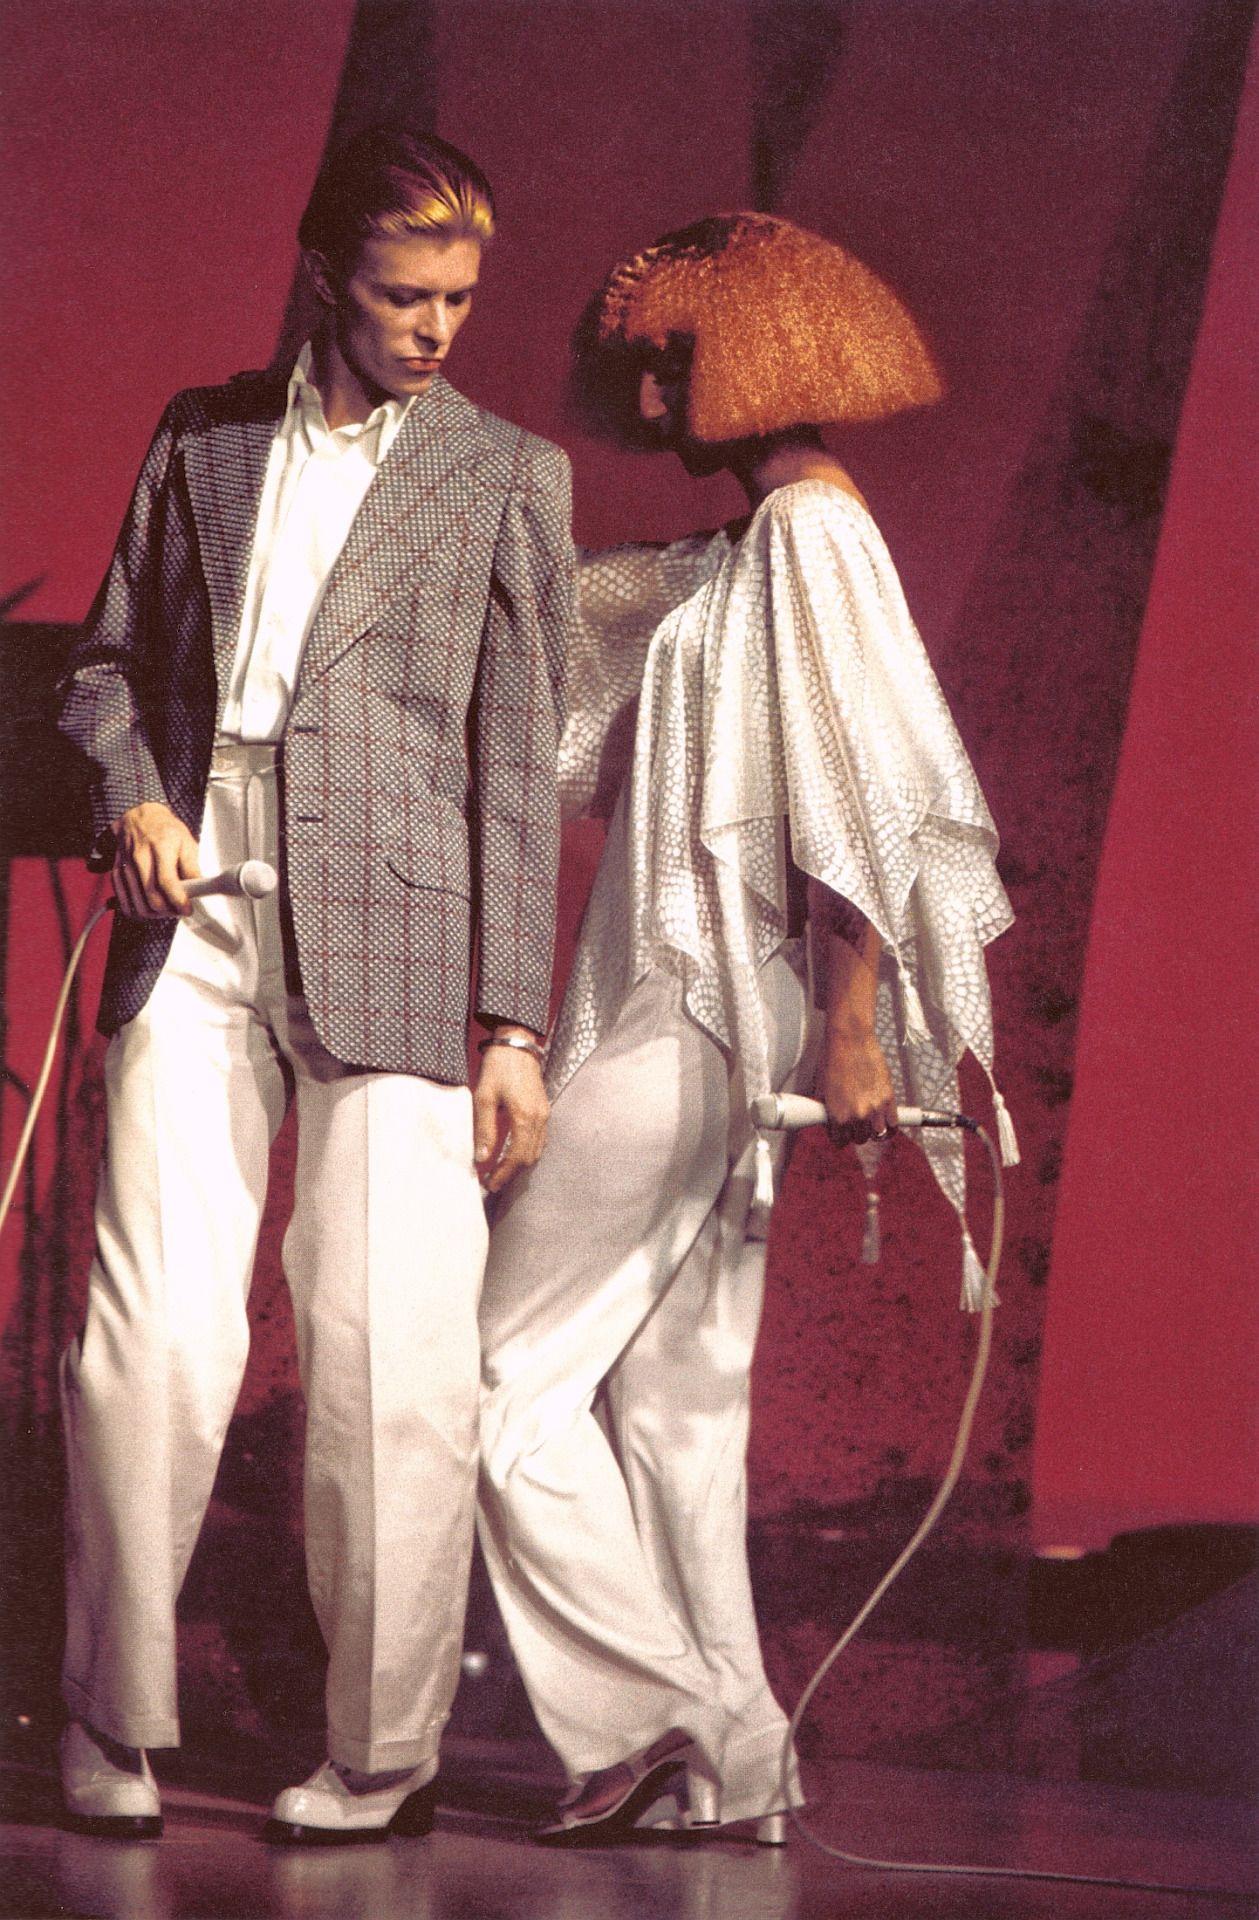 """ The Cher Show, November 23, 1975 © Steve Schapiro (unreleased photo from Schapiro's book) """